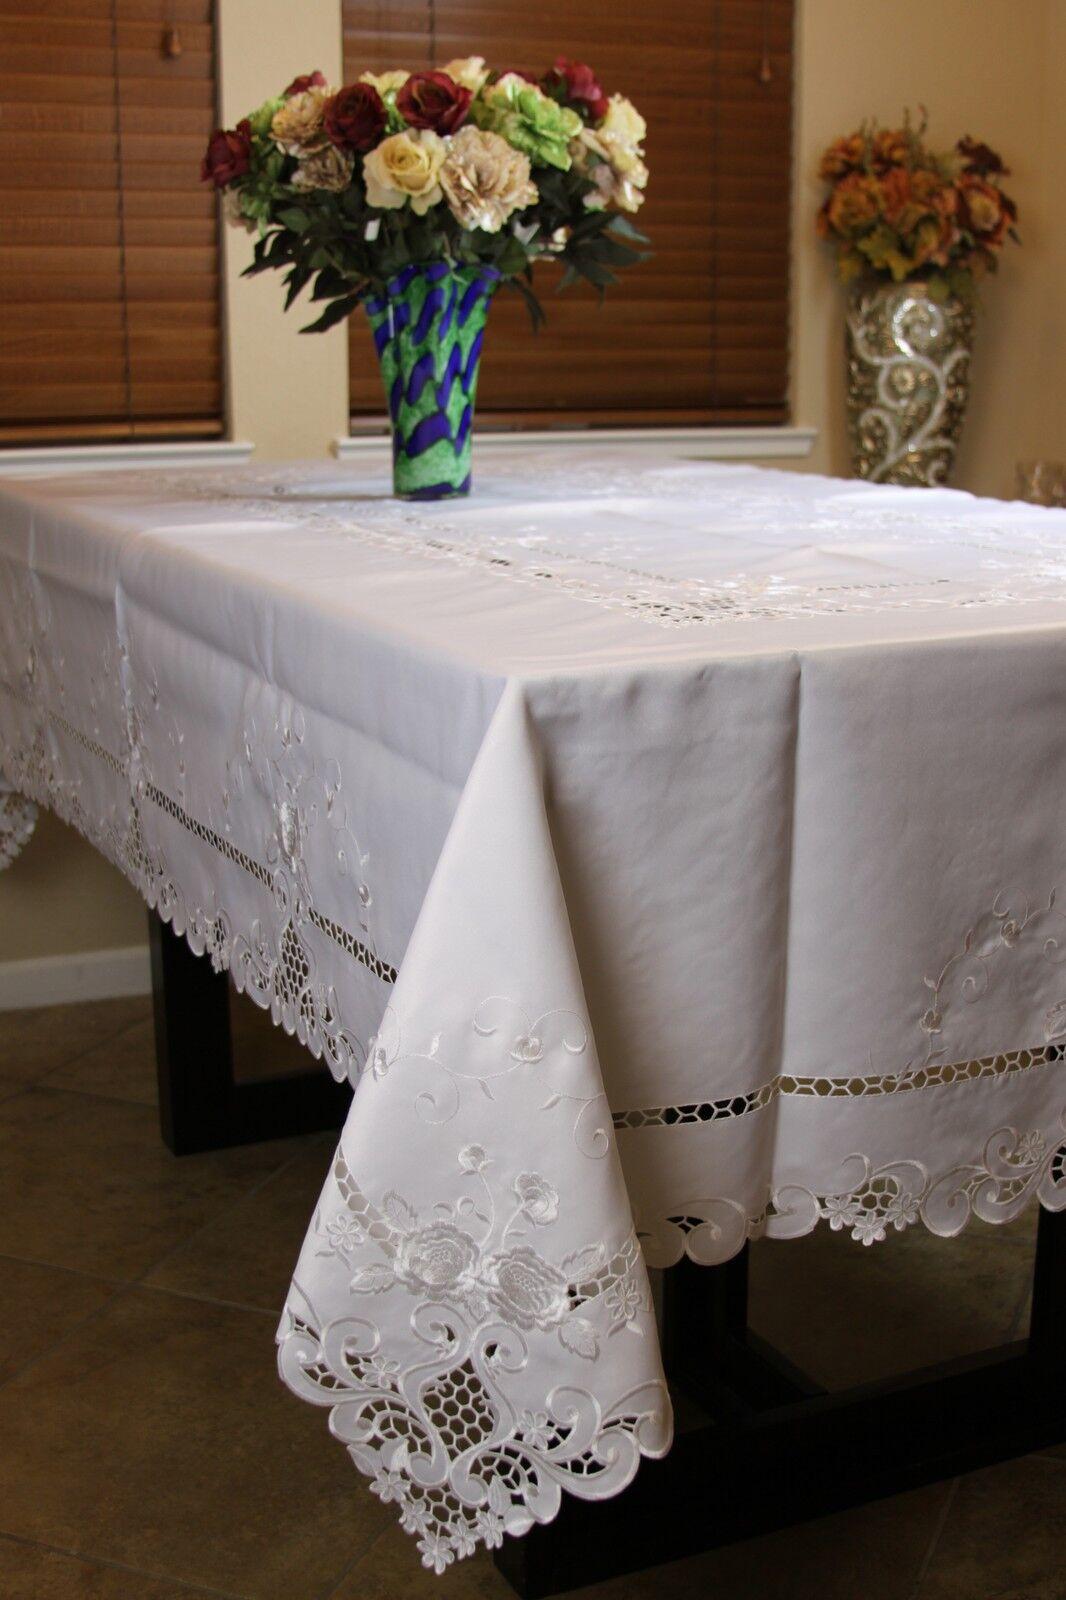 Blanc Mariage Broderie 72x108  Tissu Brodé Floral nappe 12 serviettes